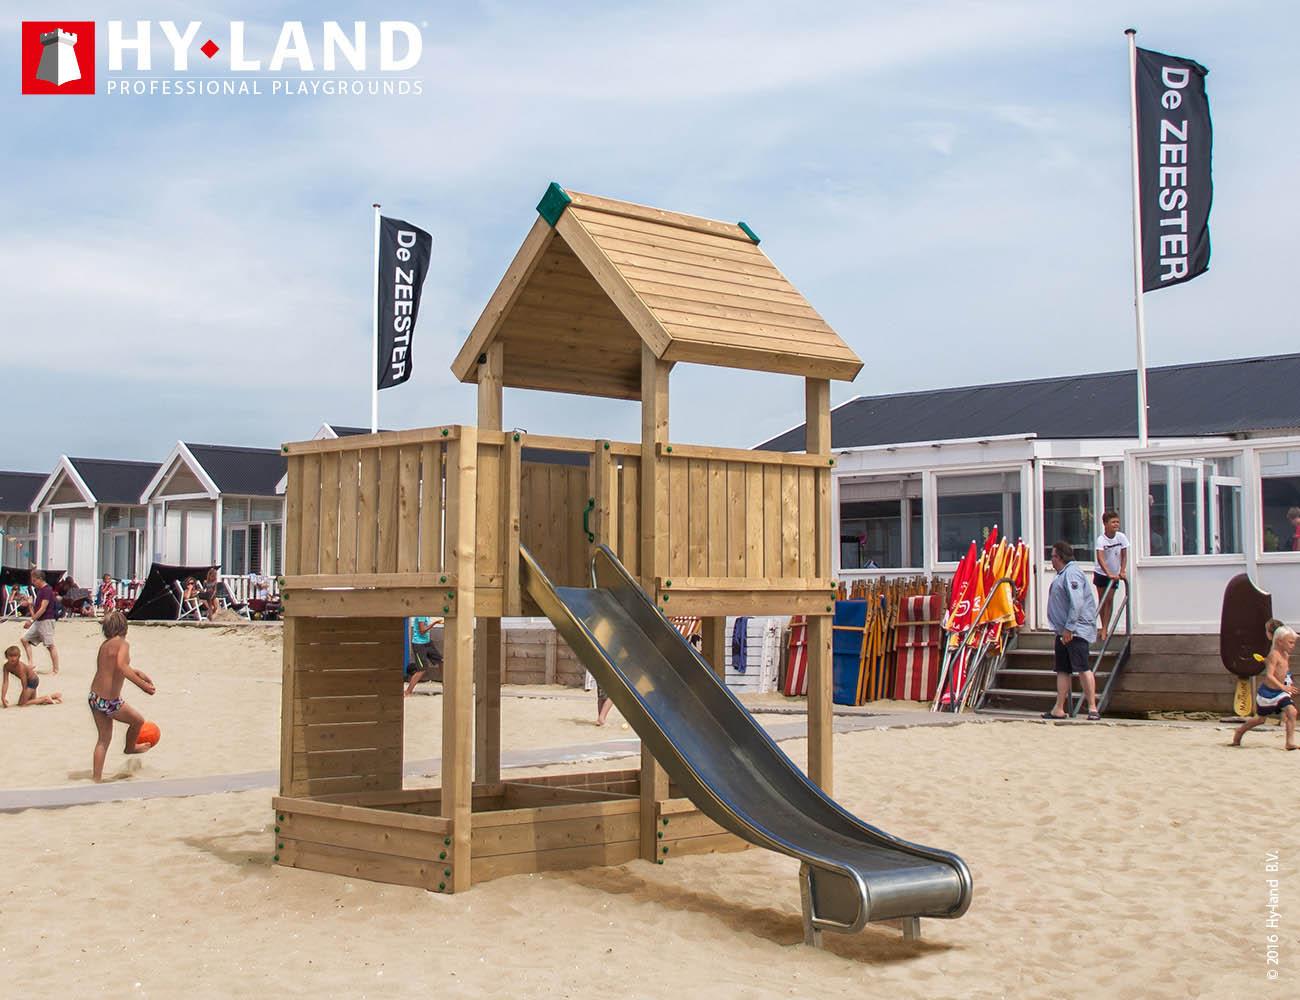 hyland projekt 3 spielturm aus douglasienholz mit 2. Black Bedroom Furniture Sets. Home Design Ideas